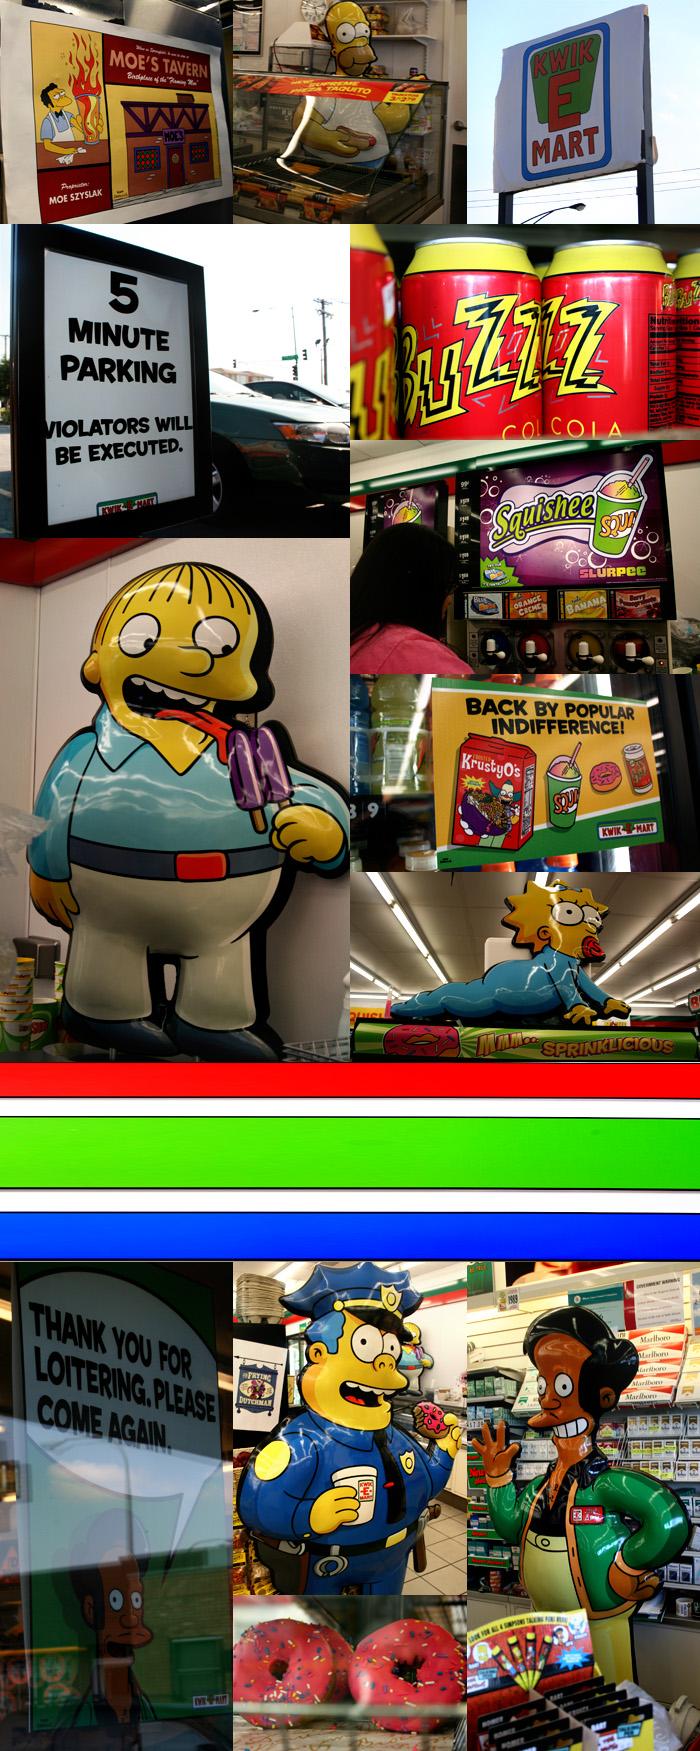 The Simpsons Kwik E Mart 7-11 in Chicago, Illinois in Chicago, Illinois